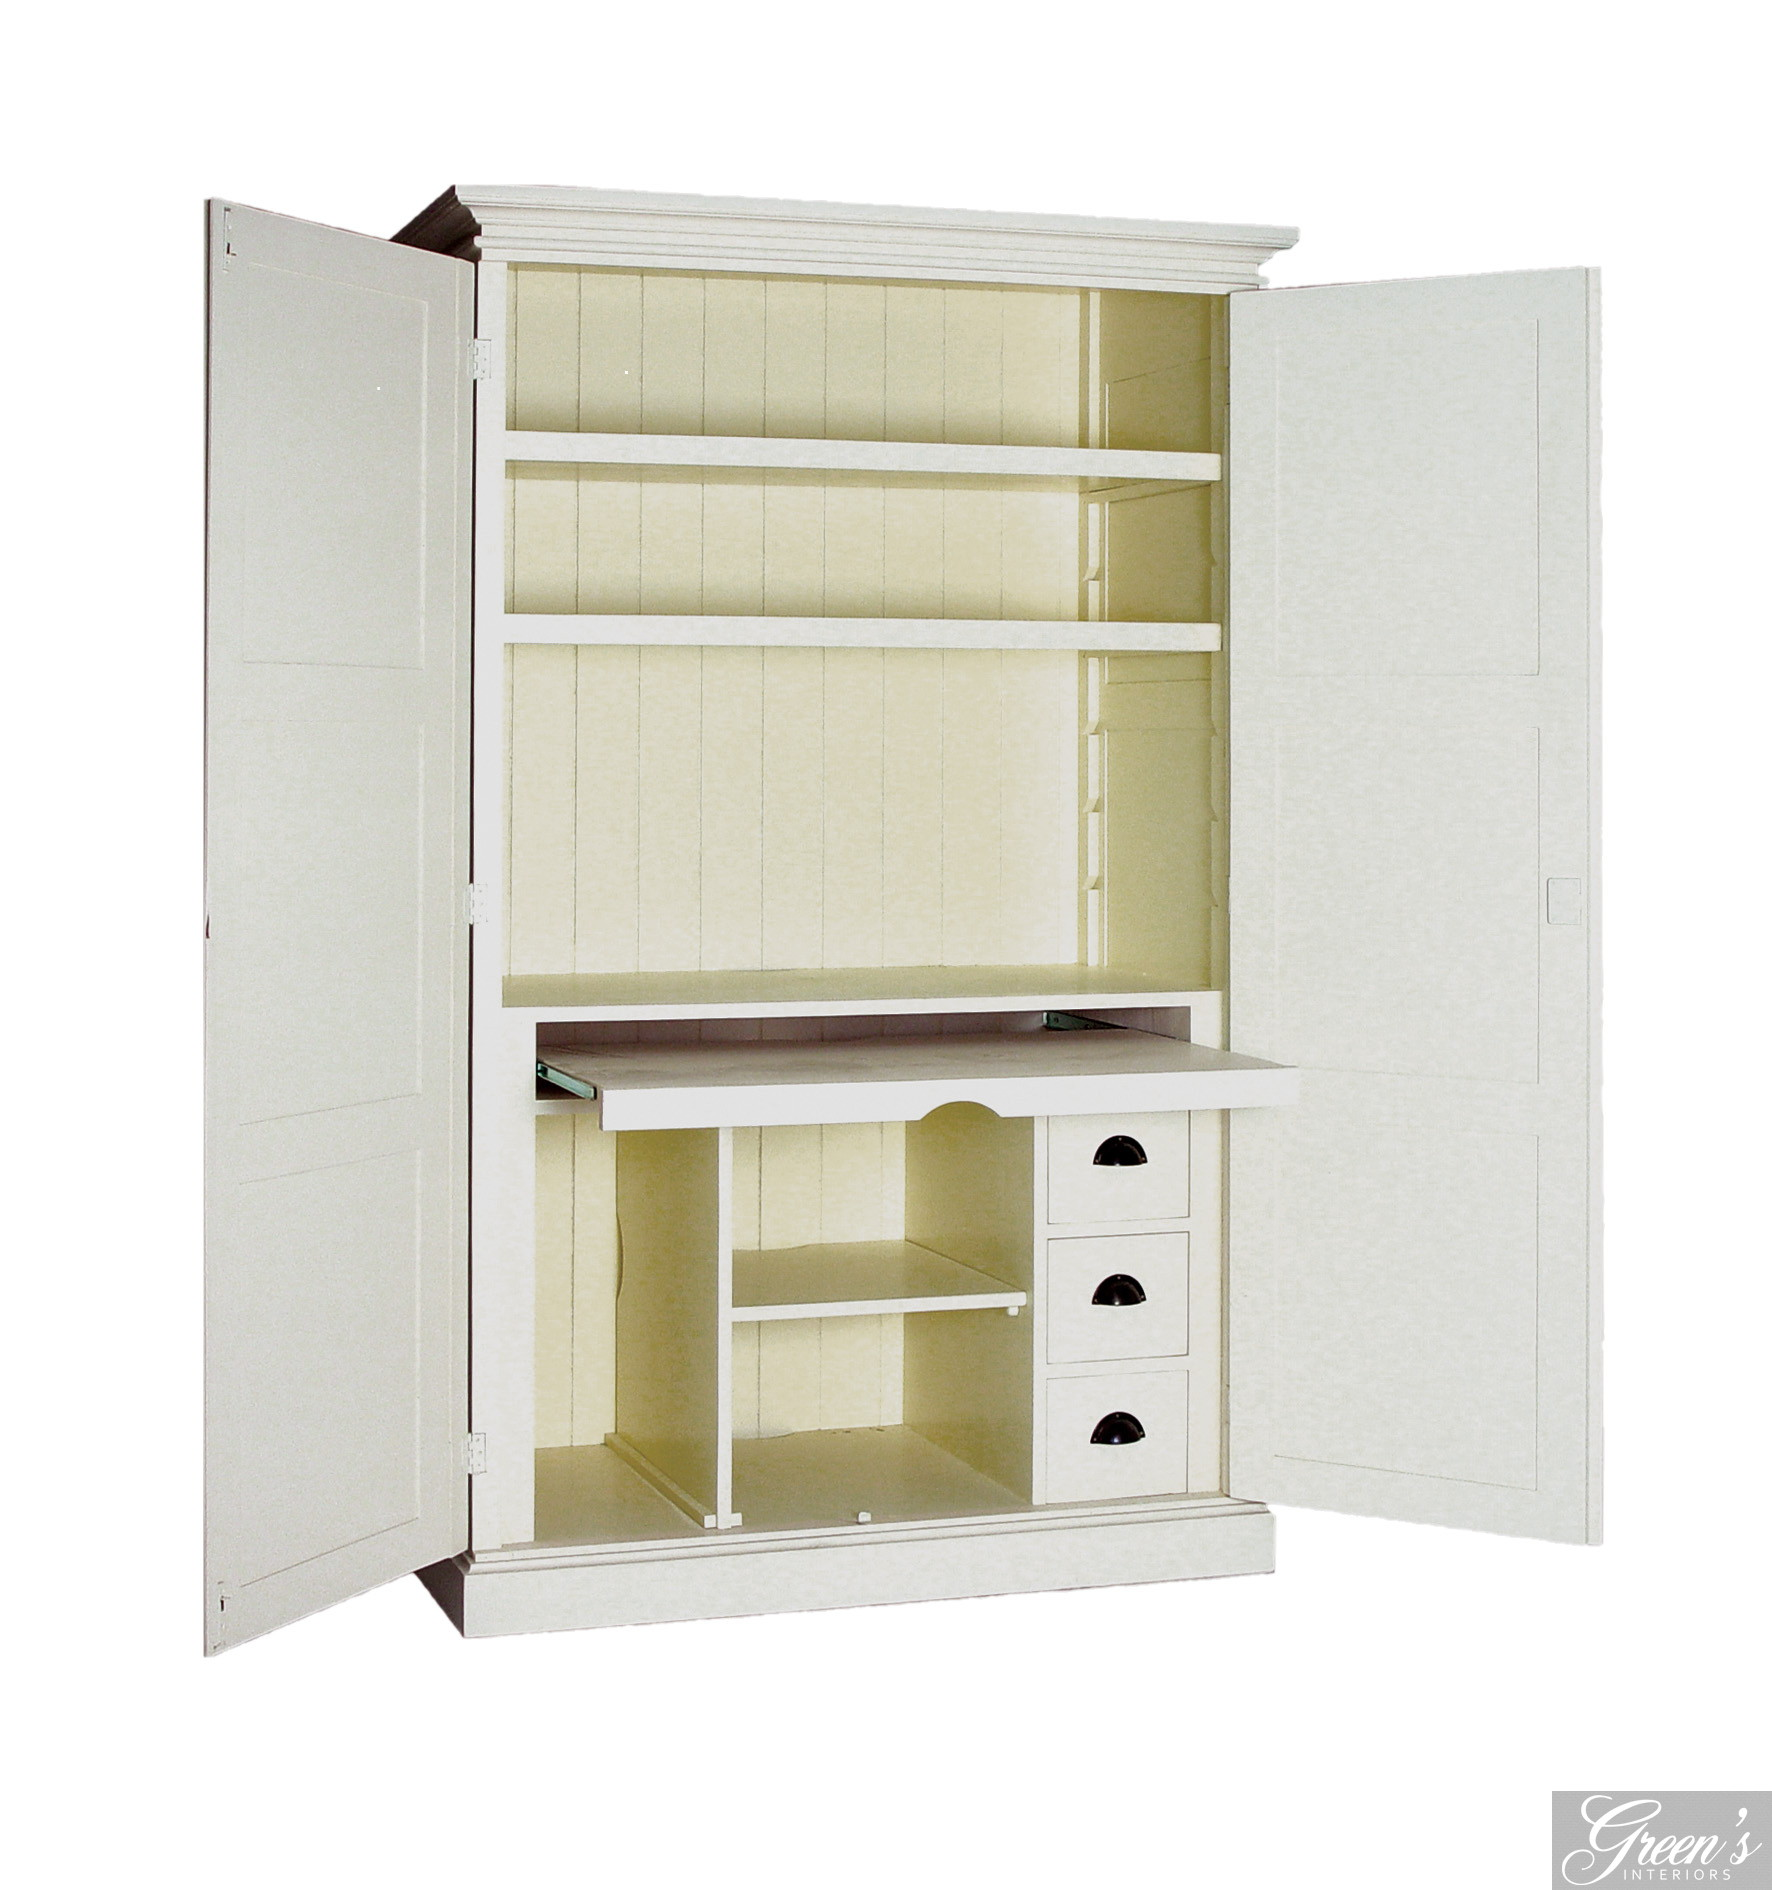 PC-Schrank, Landhaus, Houston, Kiefer farbig - DAM 2000 Ltd ...